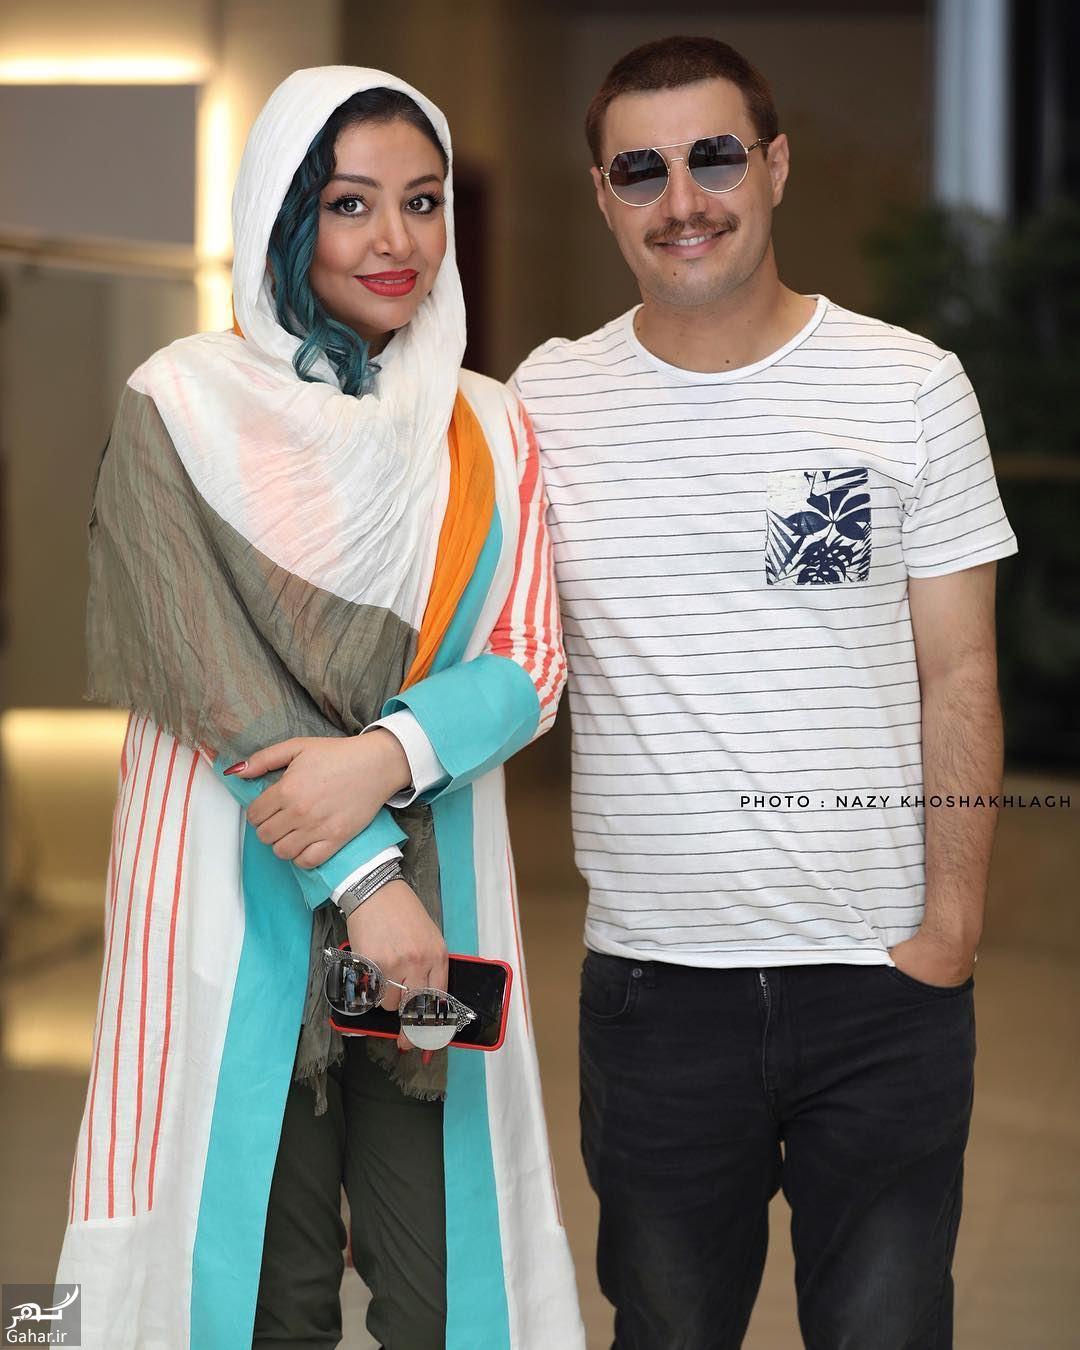 538169 Gahar ir عکس/ تیپ متفاوت جواد عزتی و همسرش در رونمایی از پوستر فیلم آینه بغل